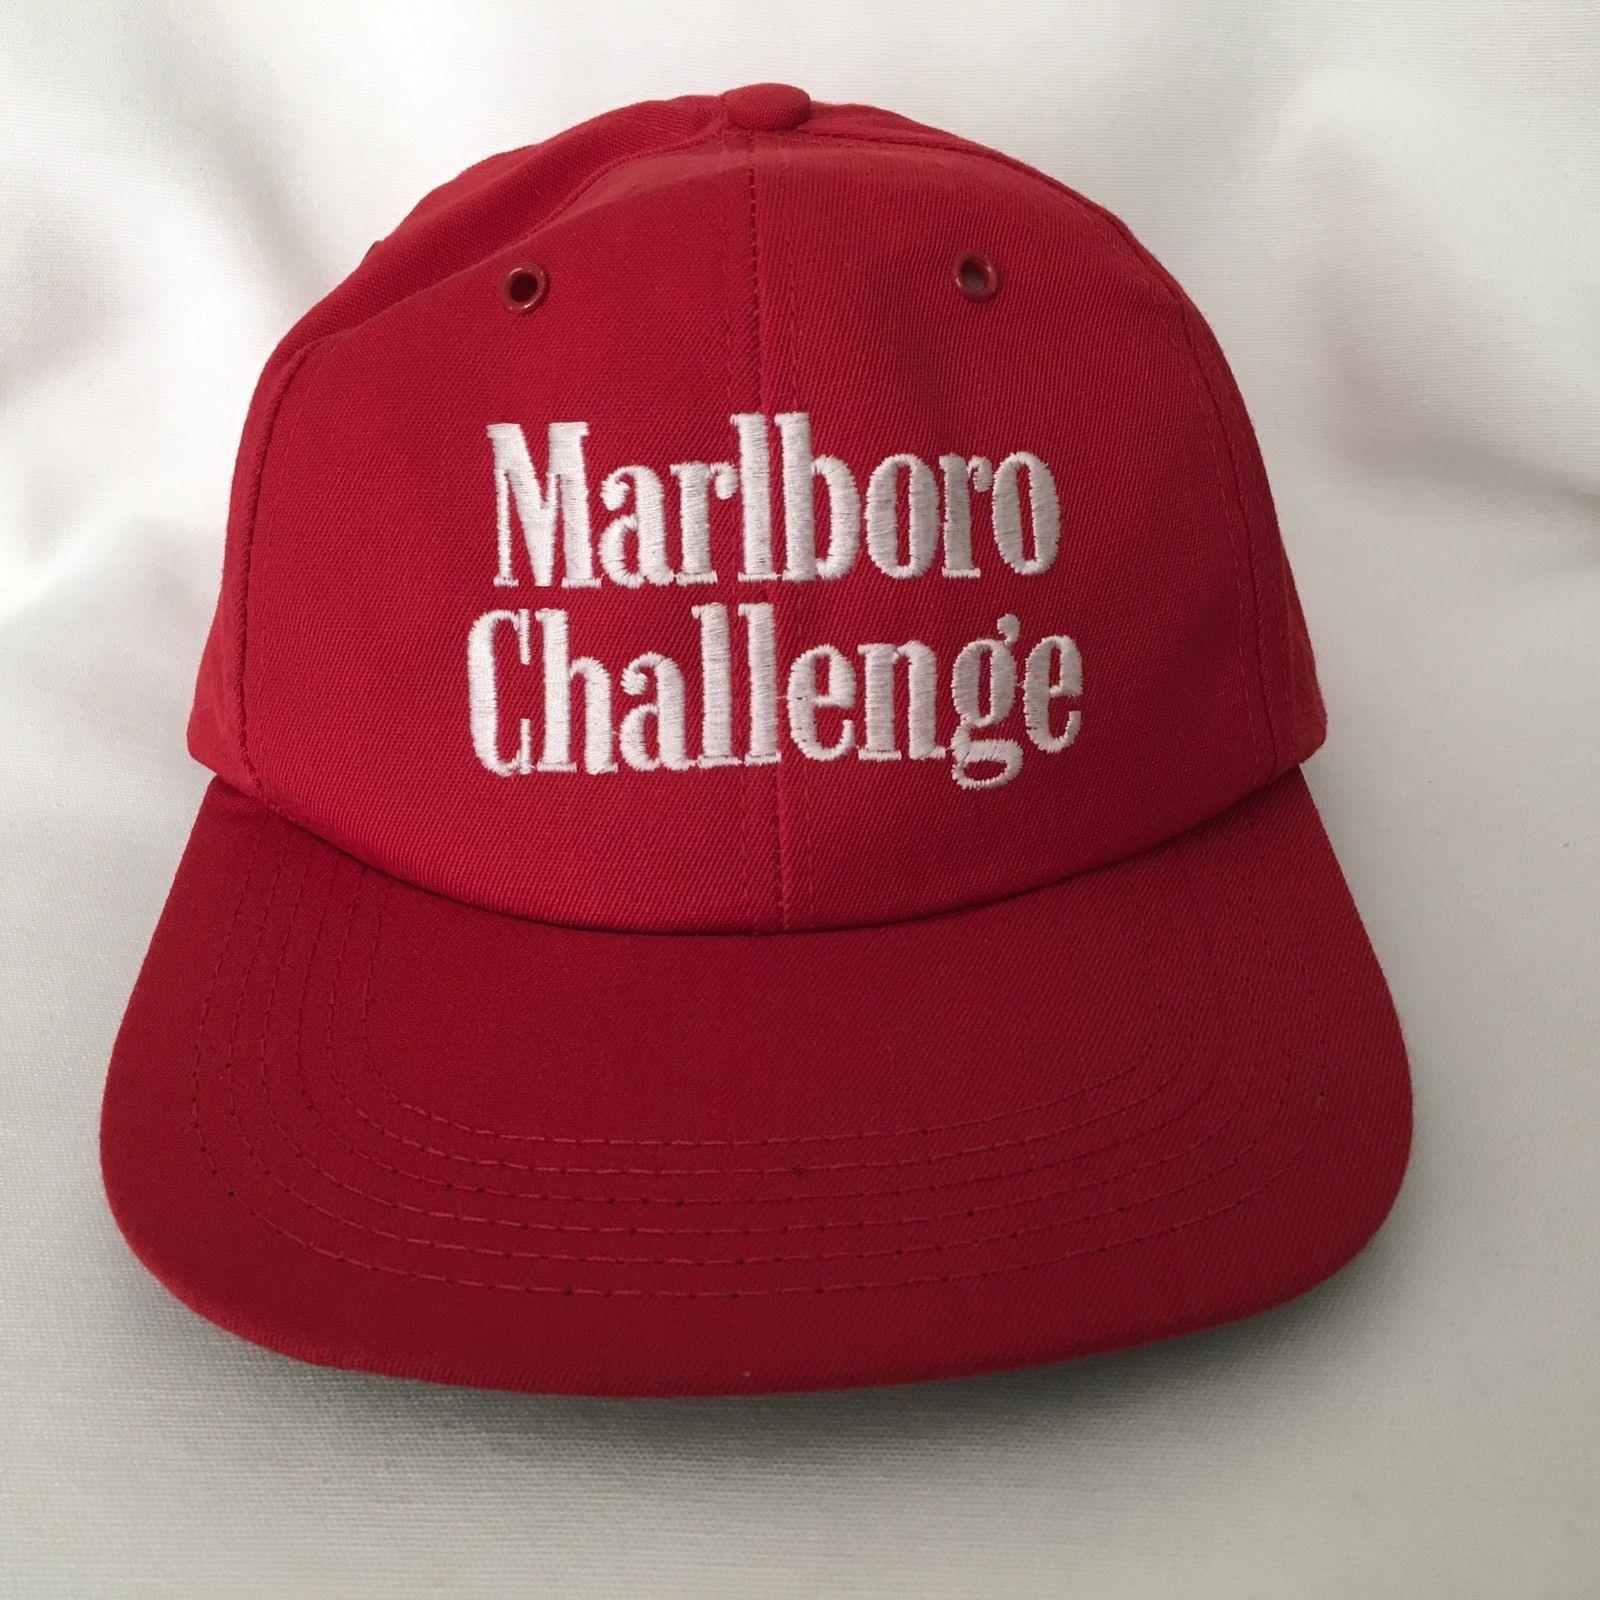 5cb8d73ecb8 Vintage Marlboro Challenge Hat Cap Snapback and 50 similar items. 57